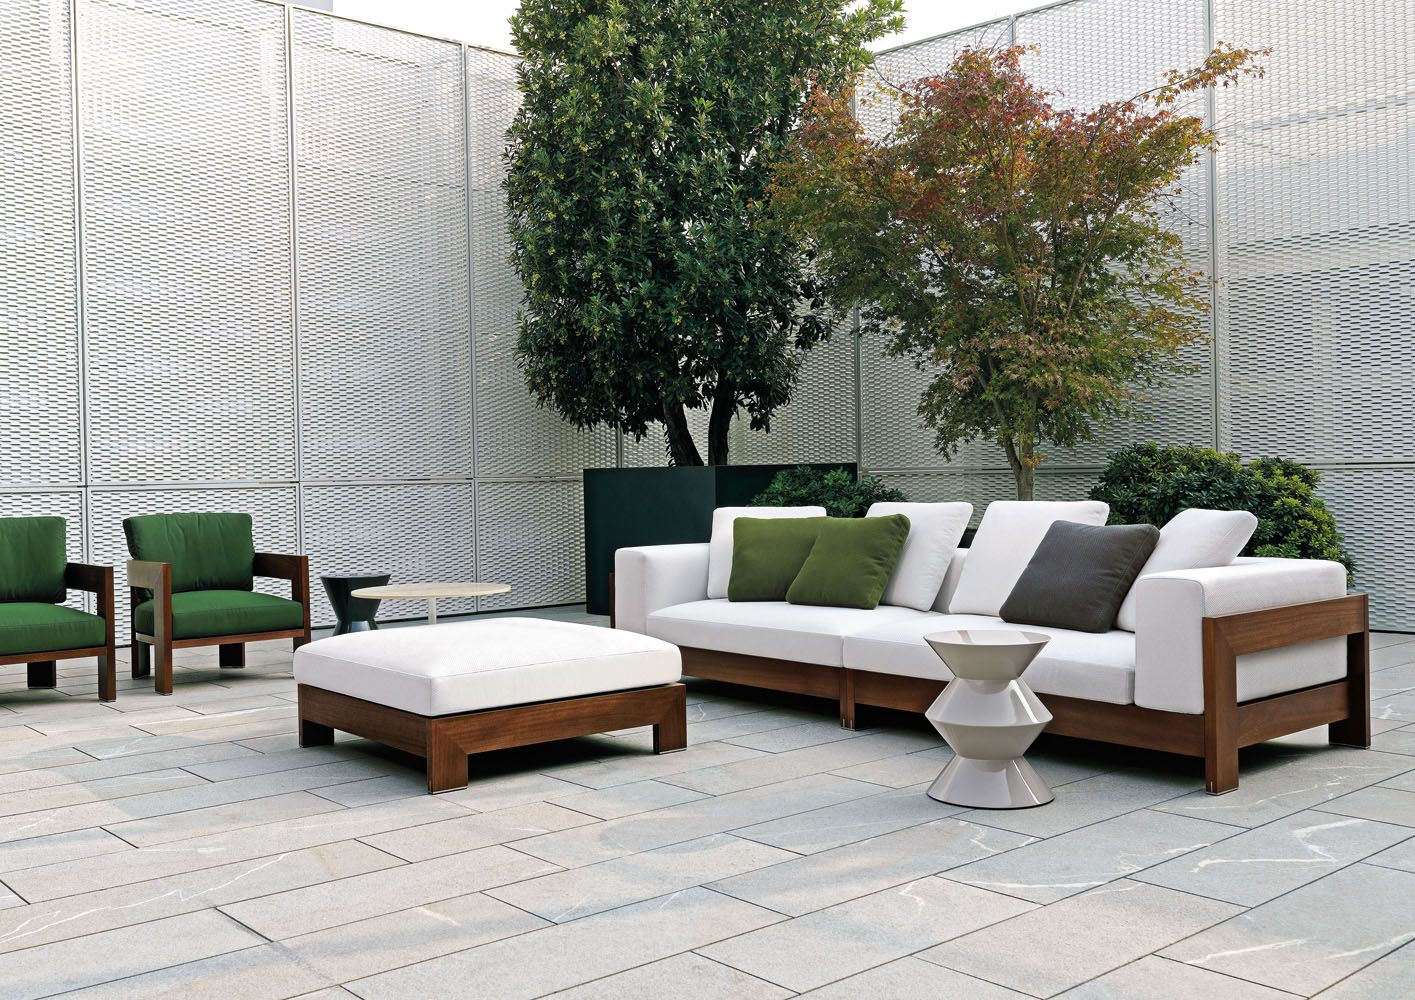 Minotti Sofas Australia Down Filled Sofa Kijiji Outdoor Furniture Bodrum House Pinterest